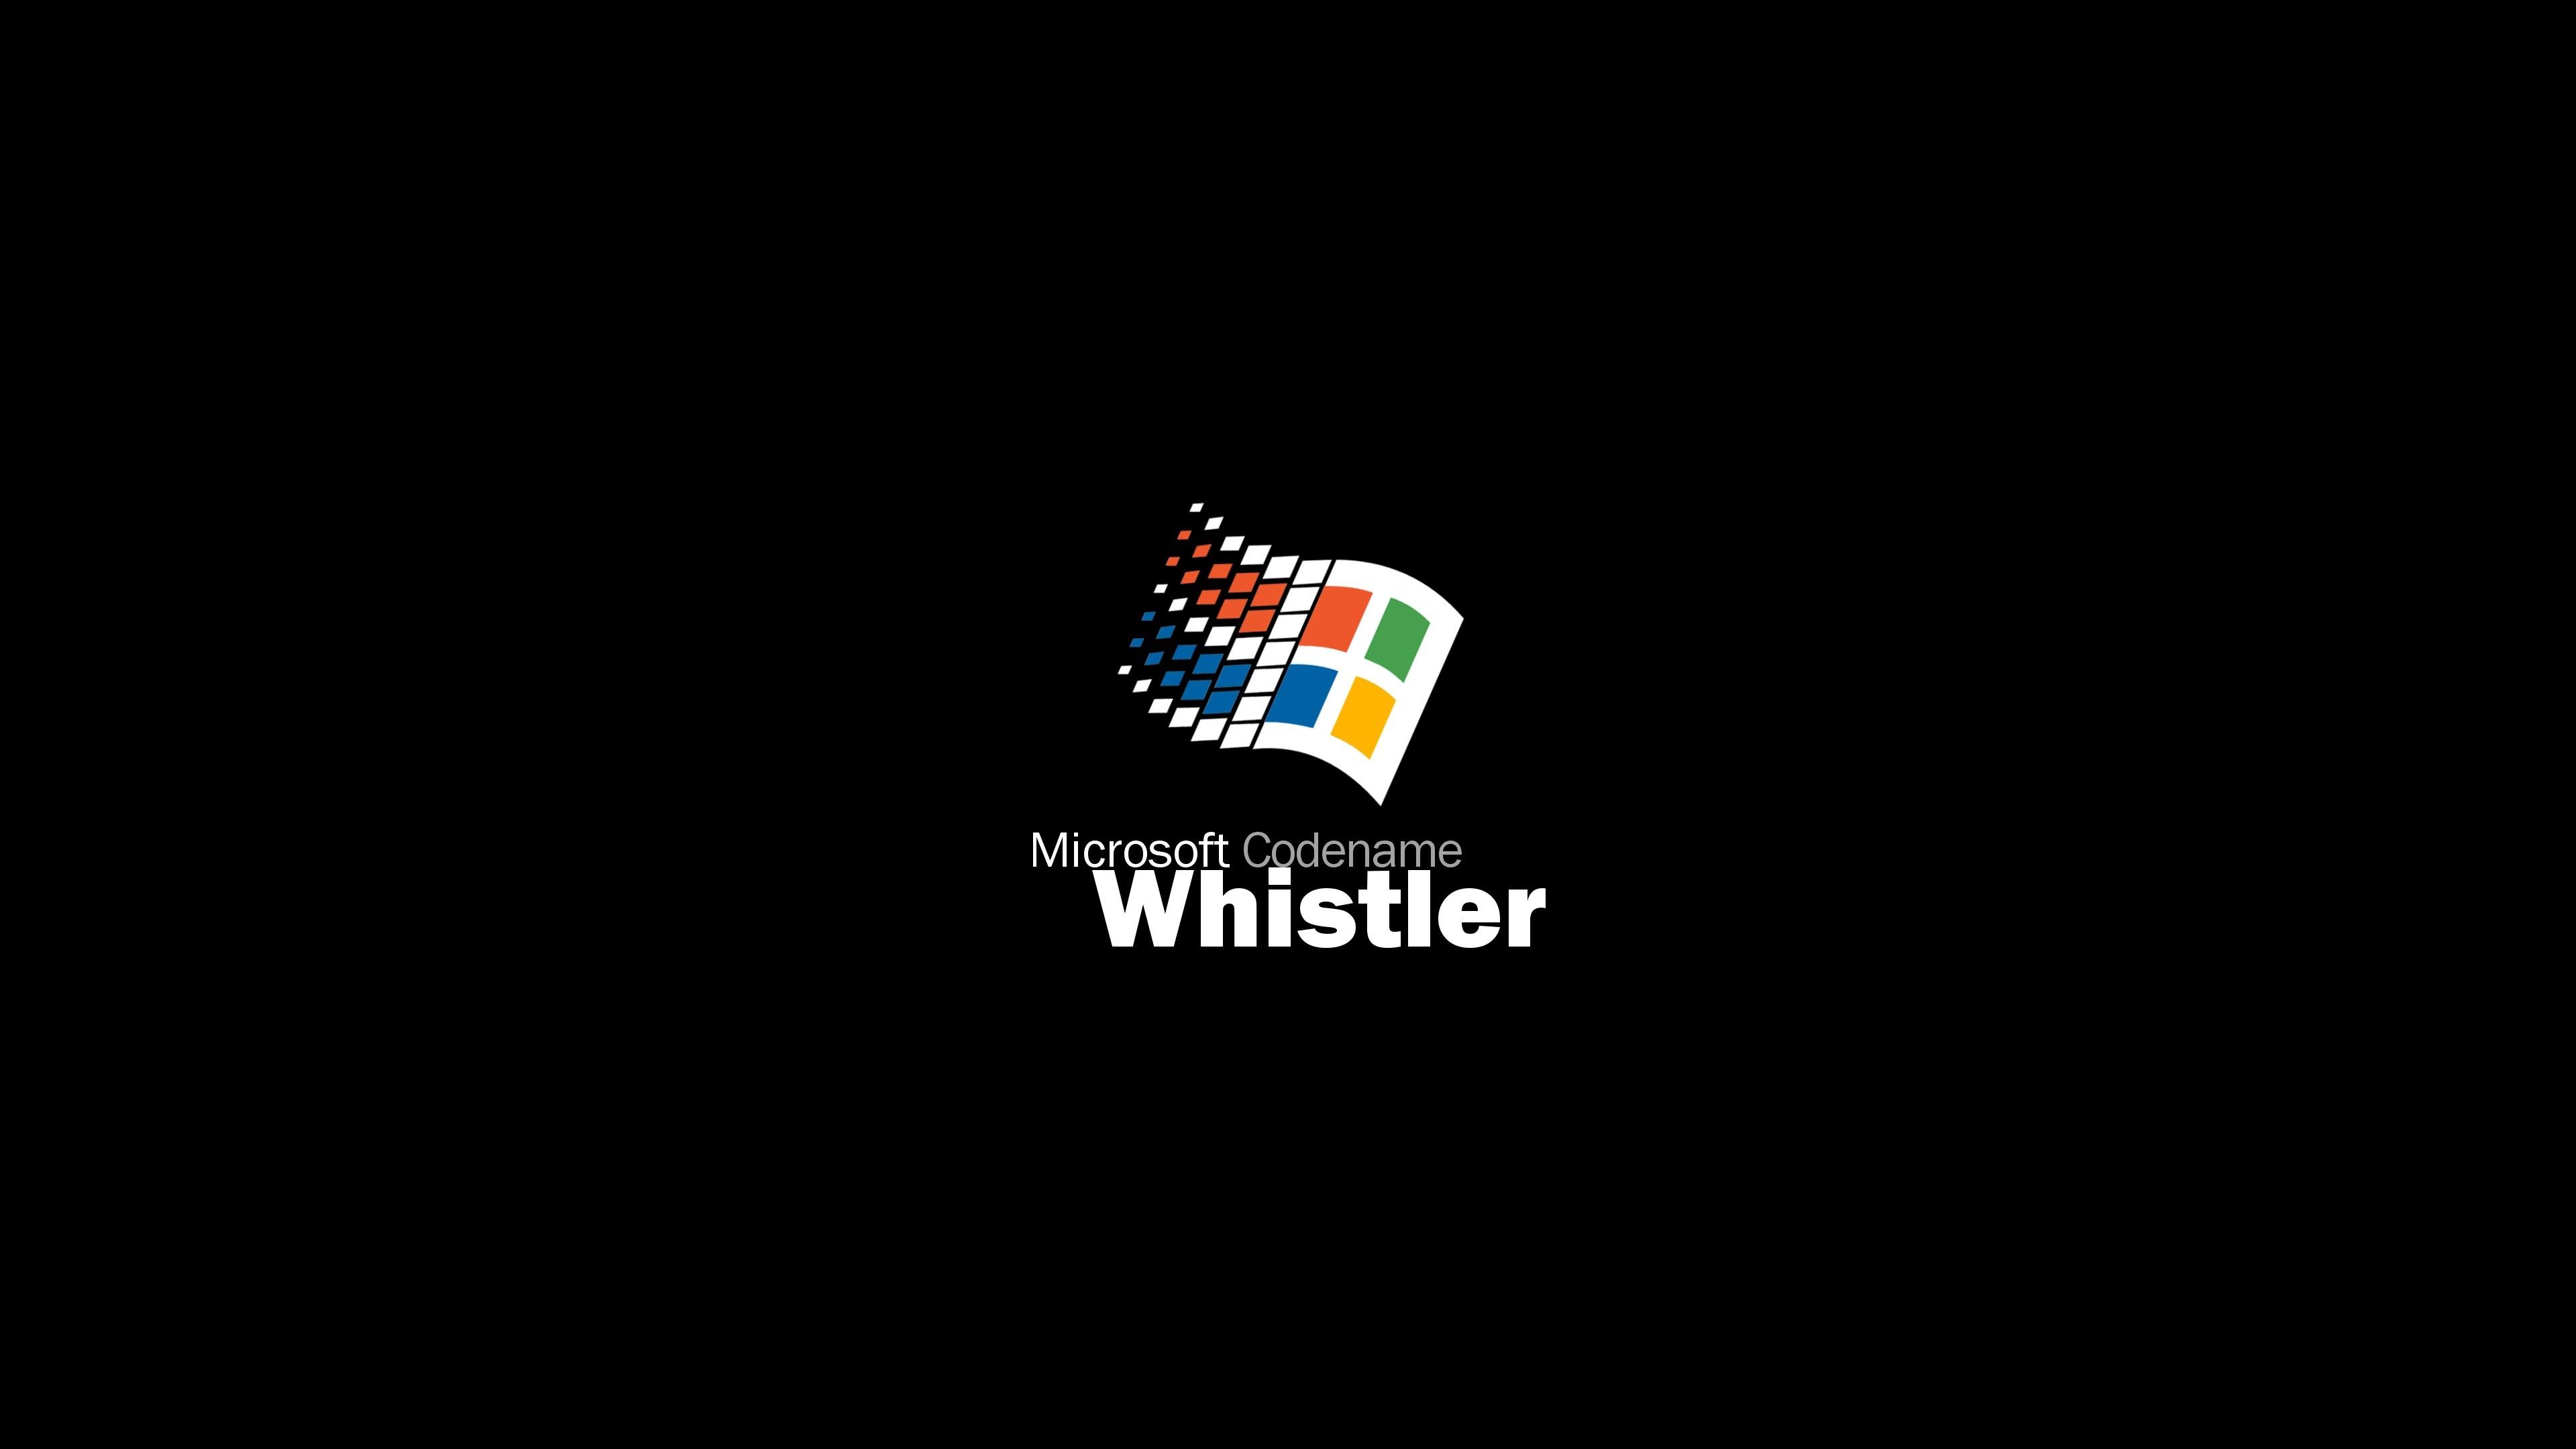 Retro Apple Wallpaper Iphone X Wallpaper Linux Vs Windows 183 ①